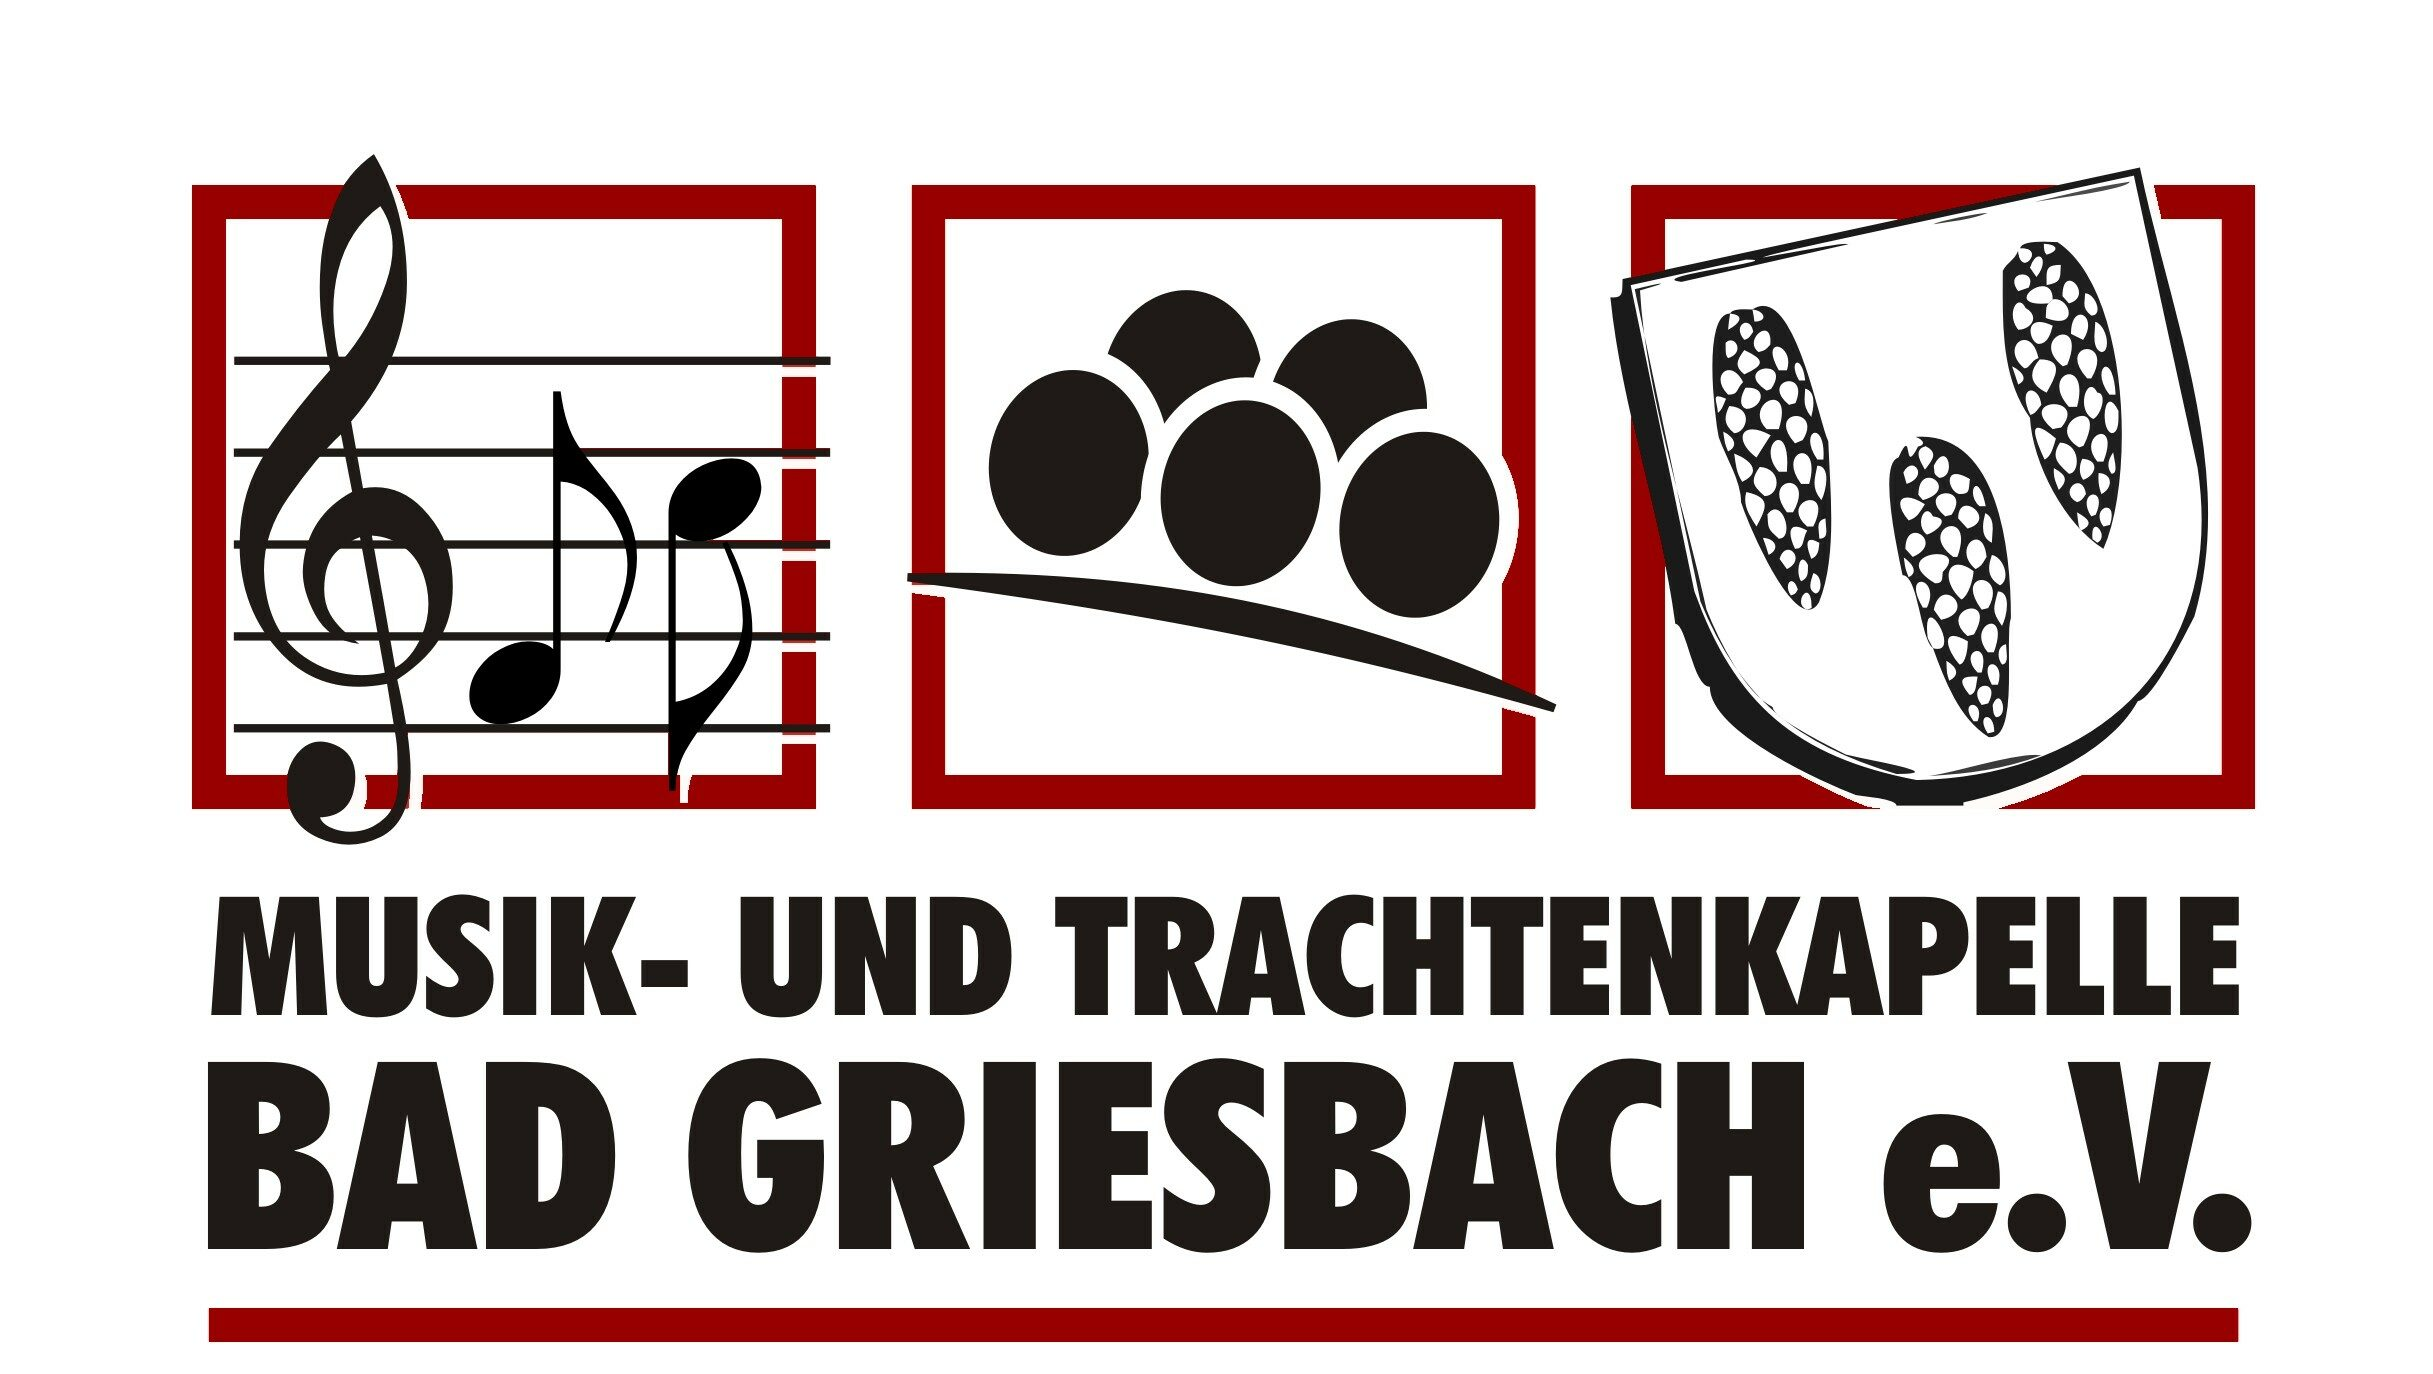 Musik- und Trachtenkapelle Bad Griesbach e.V.